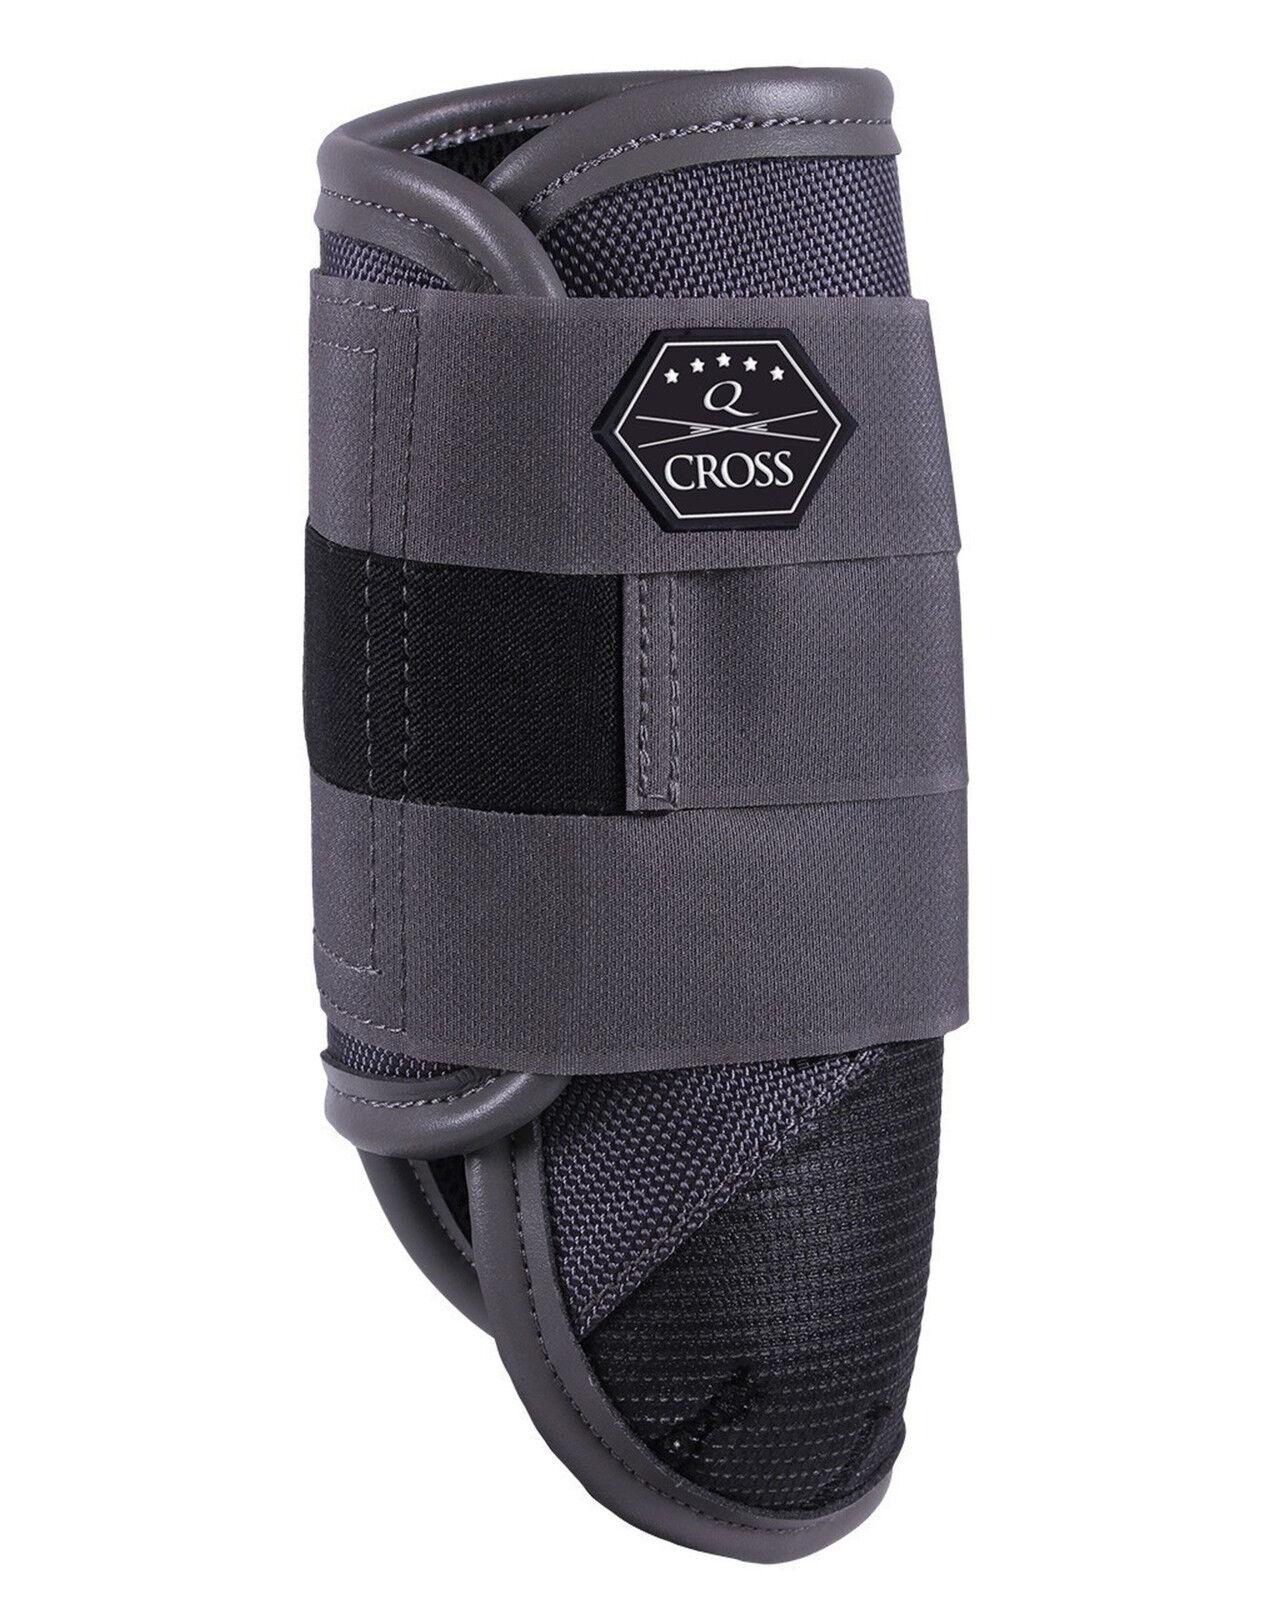 QHP Vielseitigkeit Kevlar Mikrofas -Leder Line Q-Cross vorne